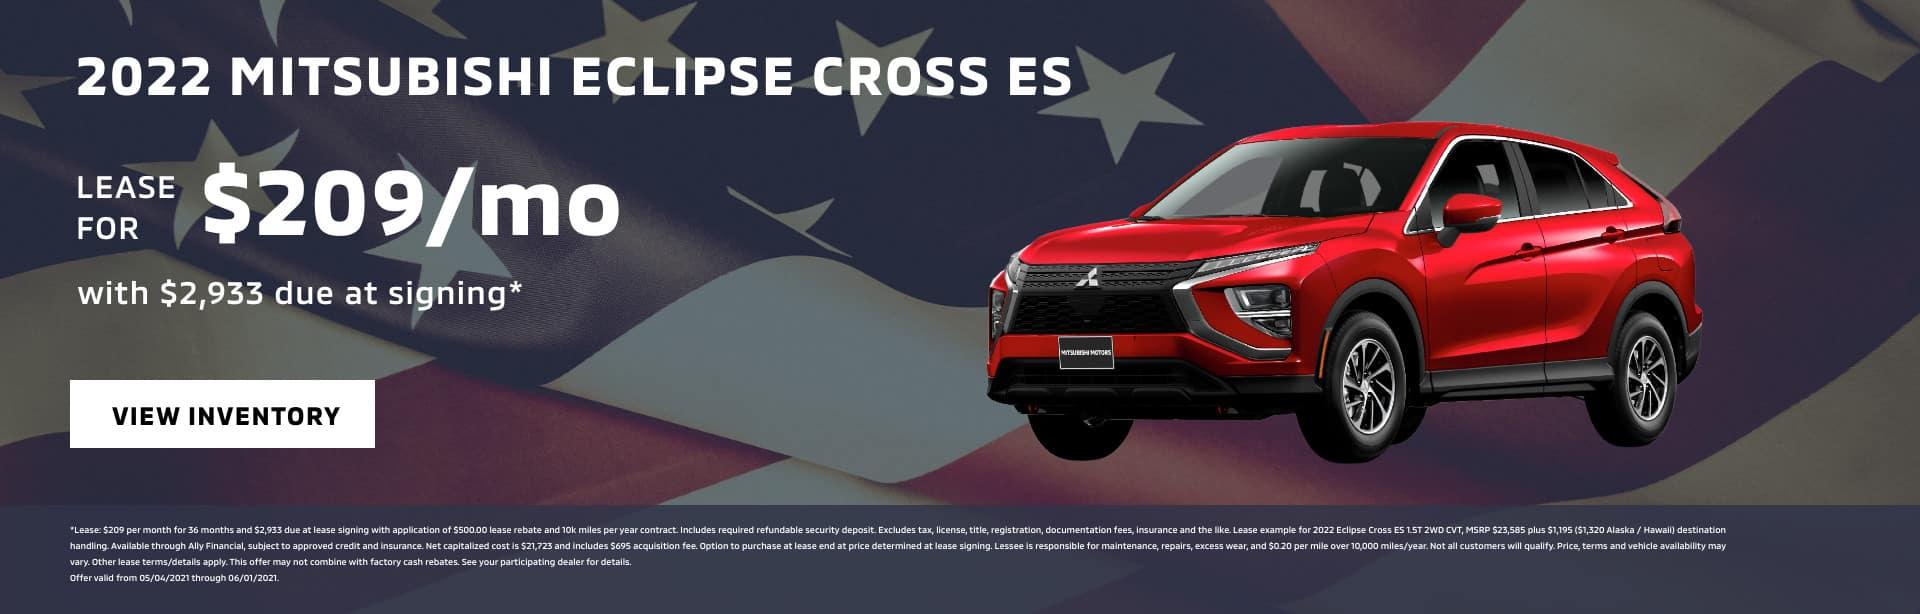 2022 Mitsubishi Eclipse Cross ES